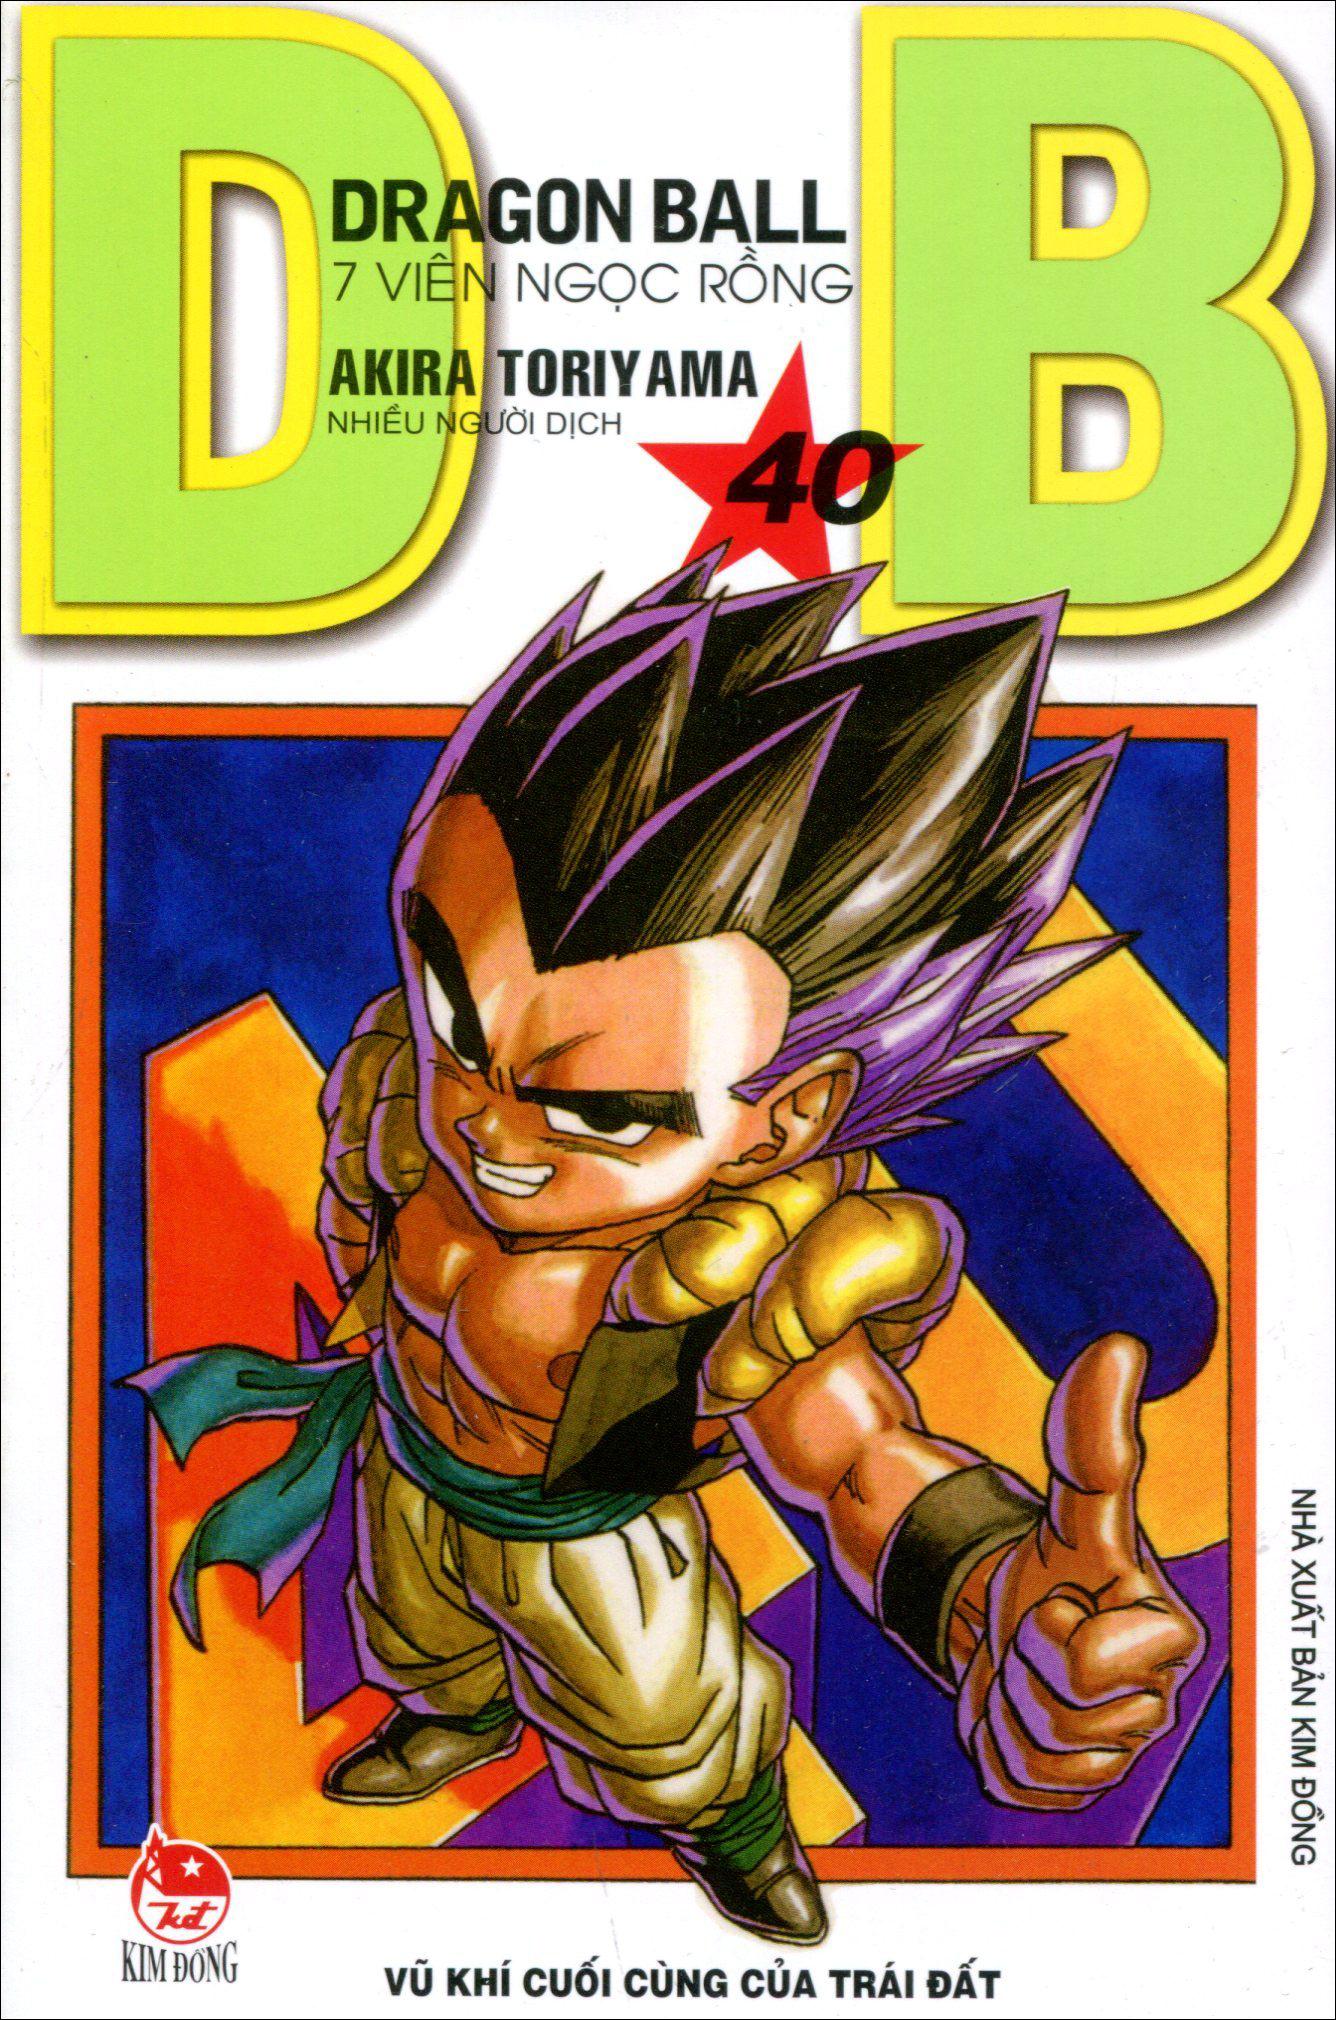 Dragon Ball - Tập 40 - 8935244804225,62_165032,19500,tiki.vn,Dragon-Ball-Tap-40-62_165032,Dragon Ball - Tập 40